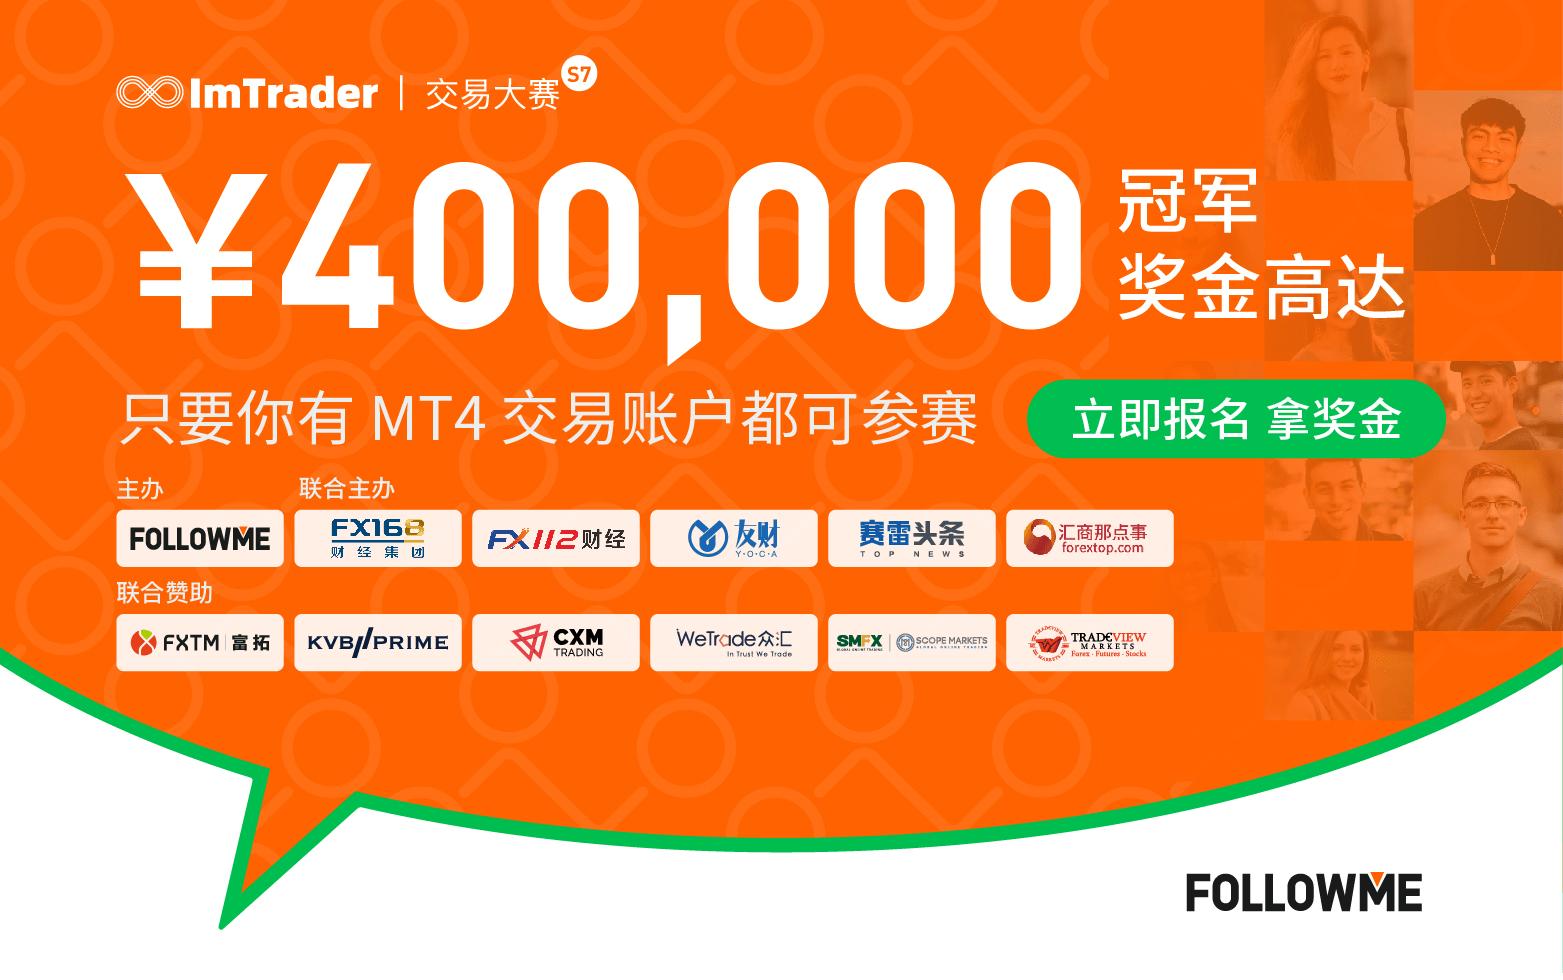 CXM 加盟 FOLLOWME 第7届交易大赛,使用 CXM 账户参赛,奖金翻倍!